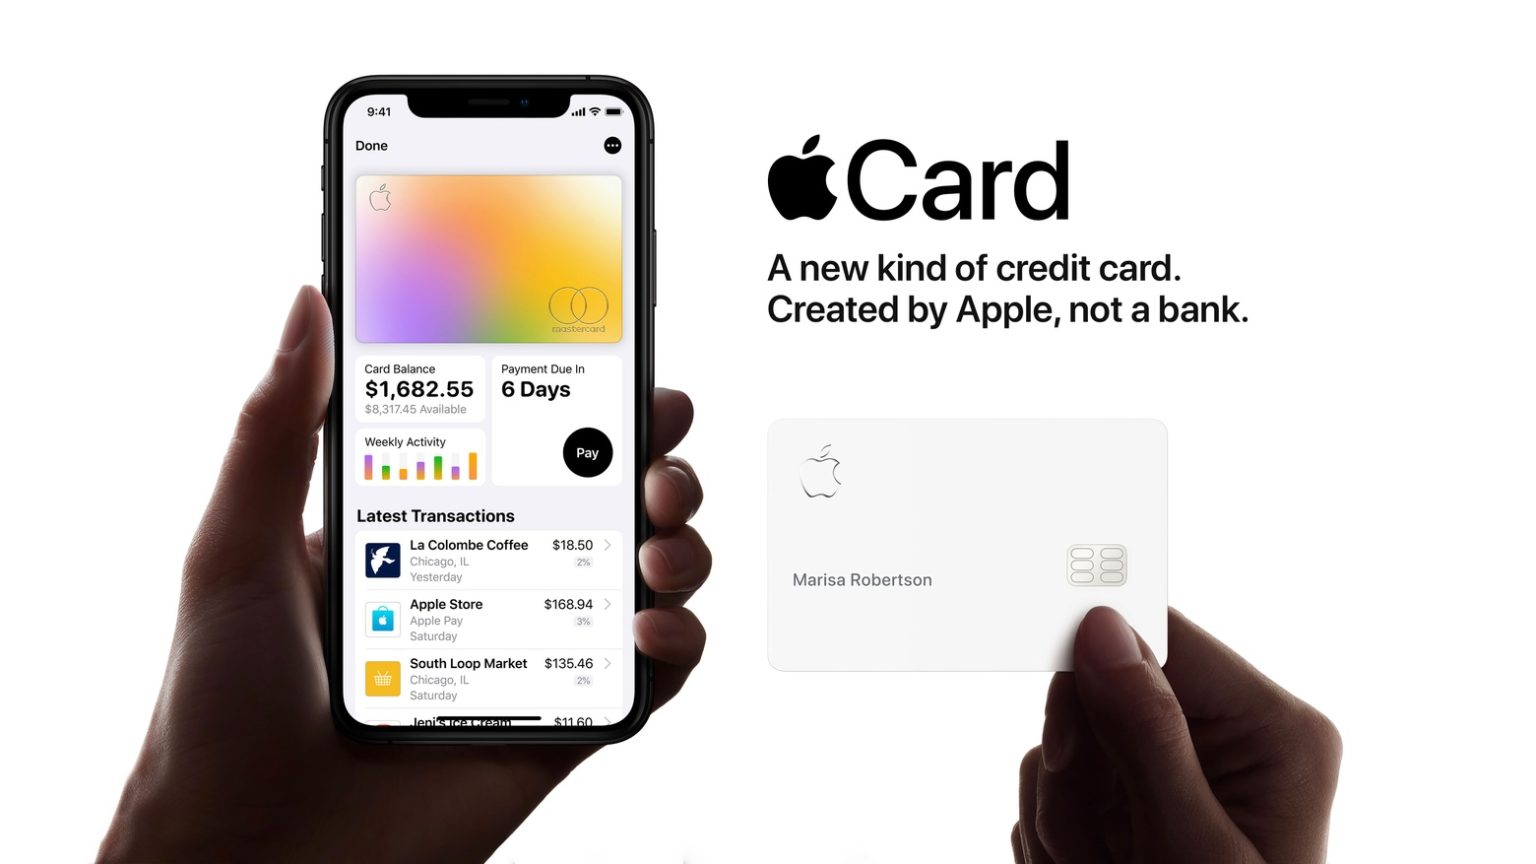 Apple Card is underwritten by Goldman Sachs.